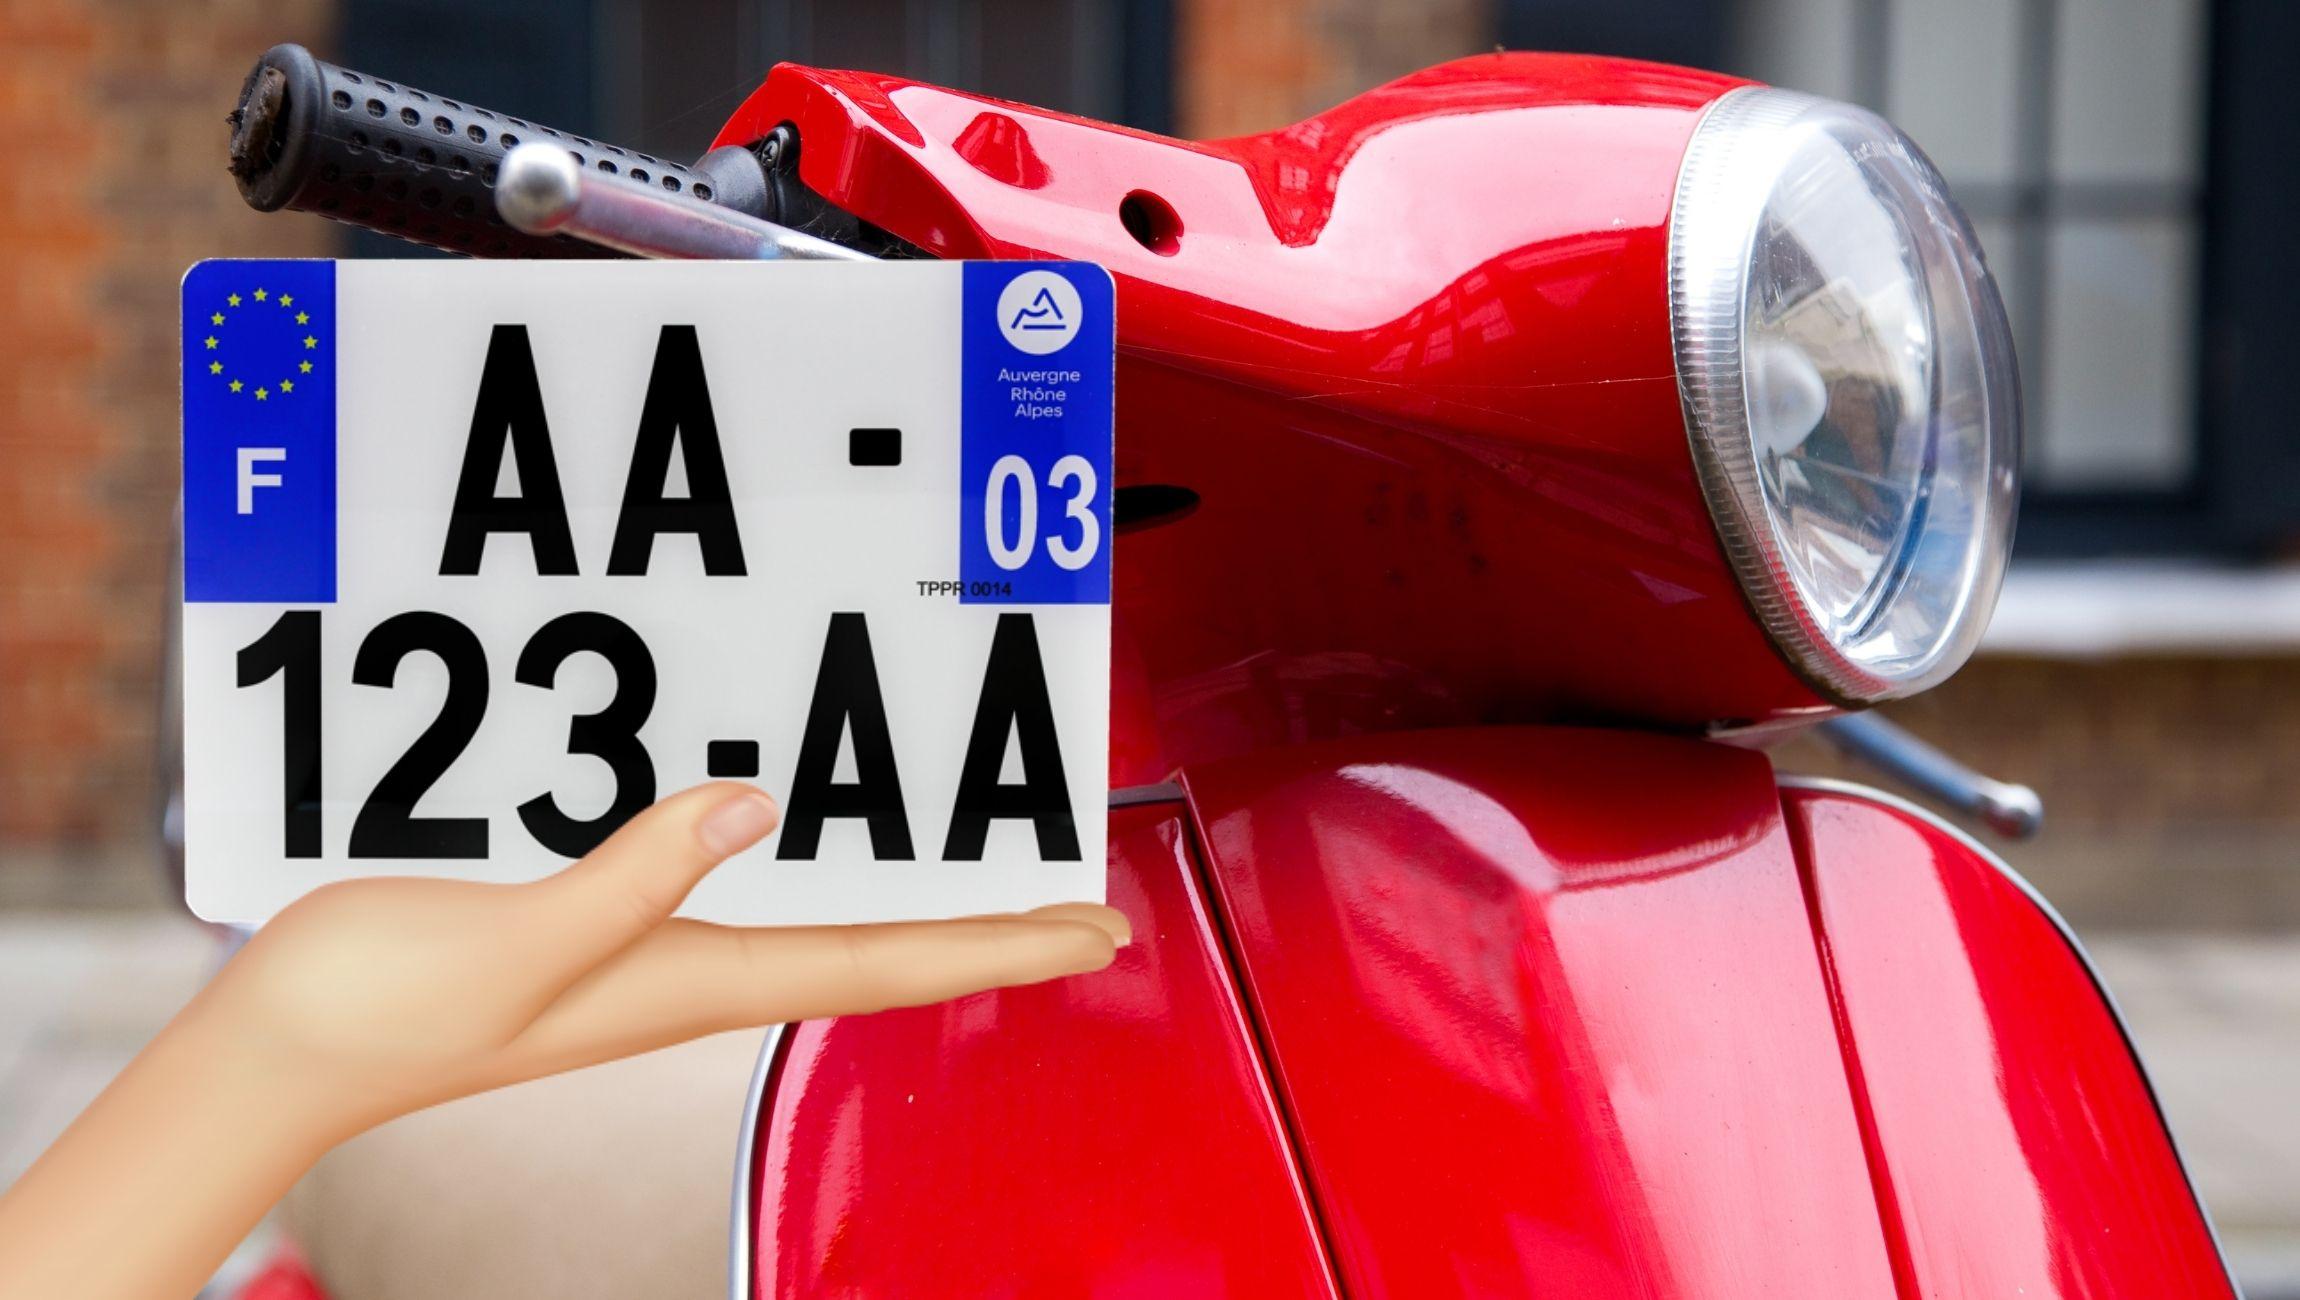 Plaque d'immatriculation pour scooter